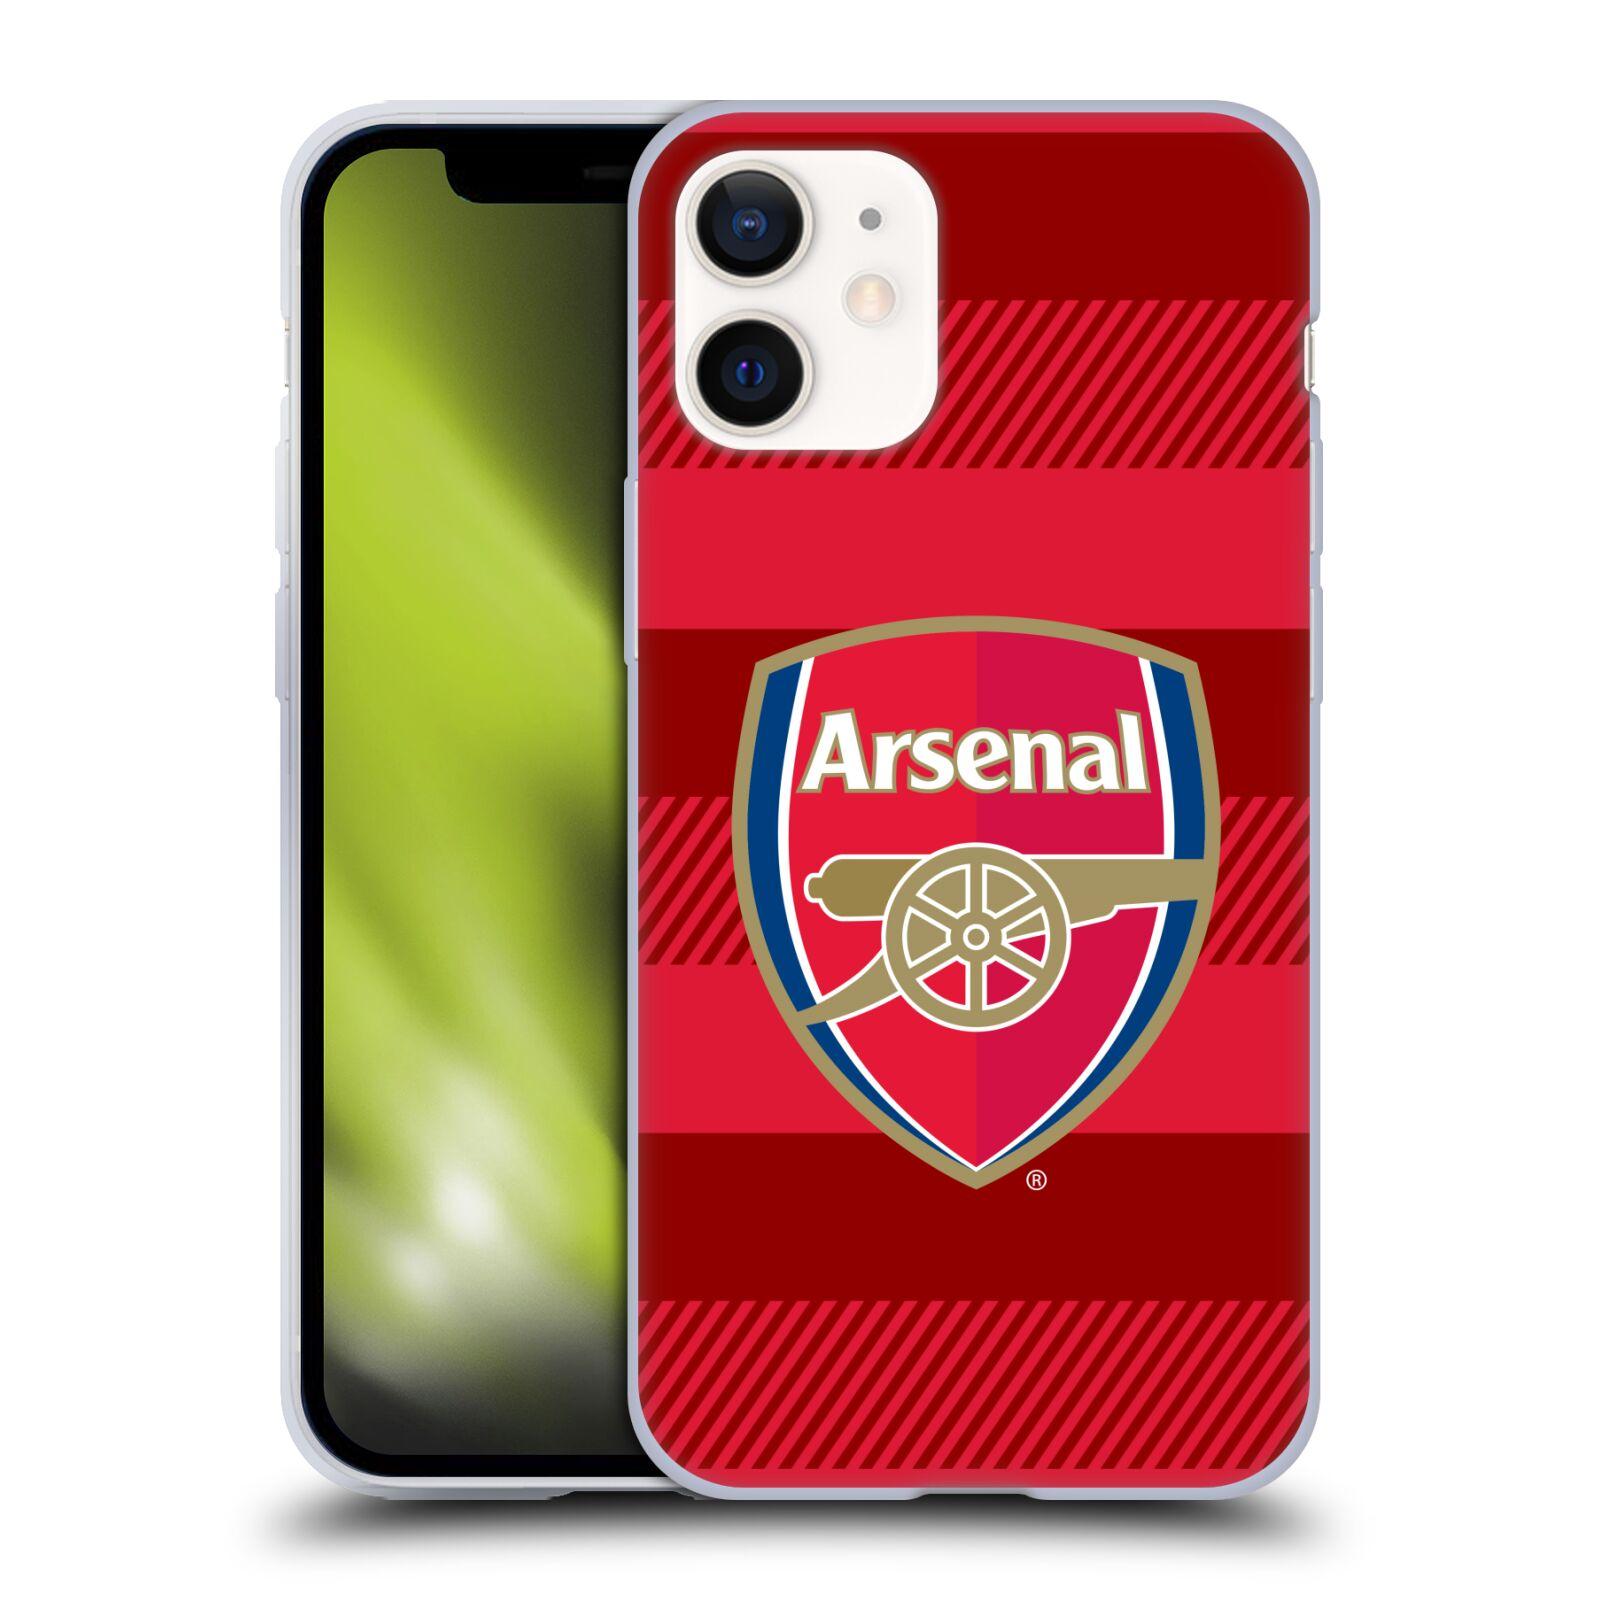 Silikonové pouzdro na mobil Apple iPhone 12 Mini - Head Case - Arsenal FC - Logo s pruhy